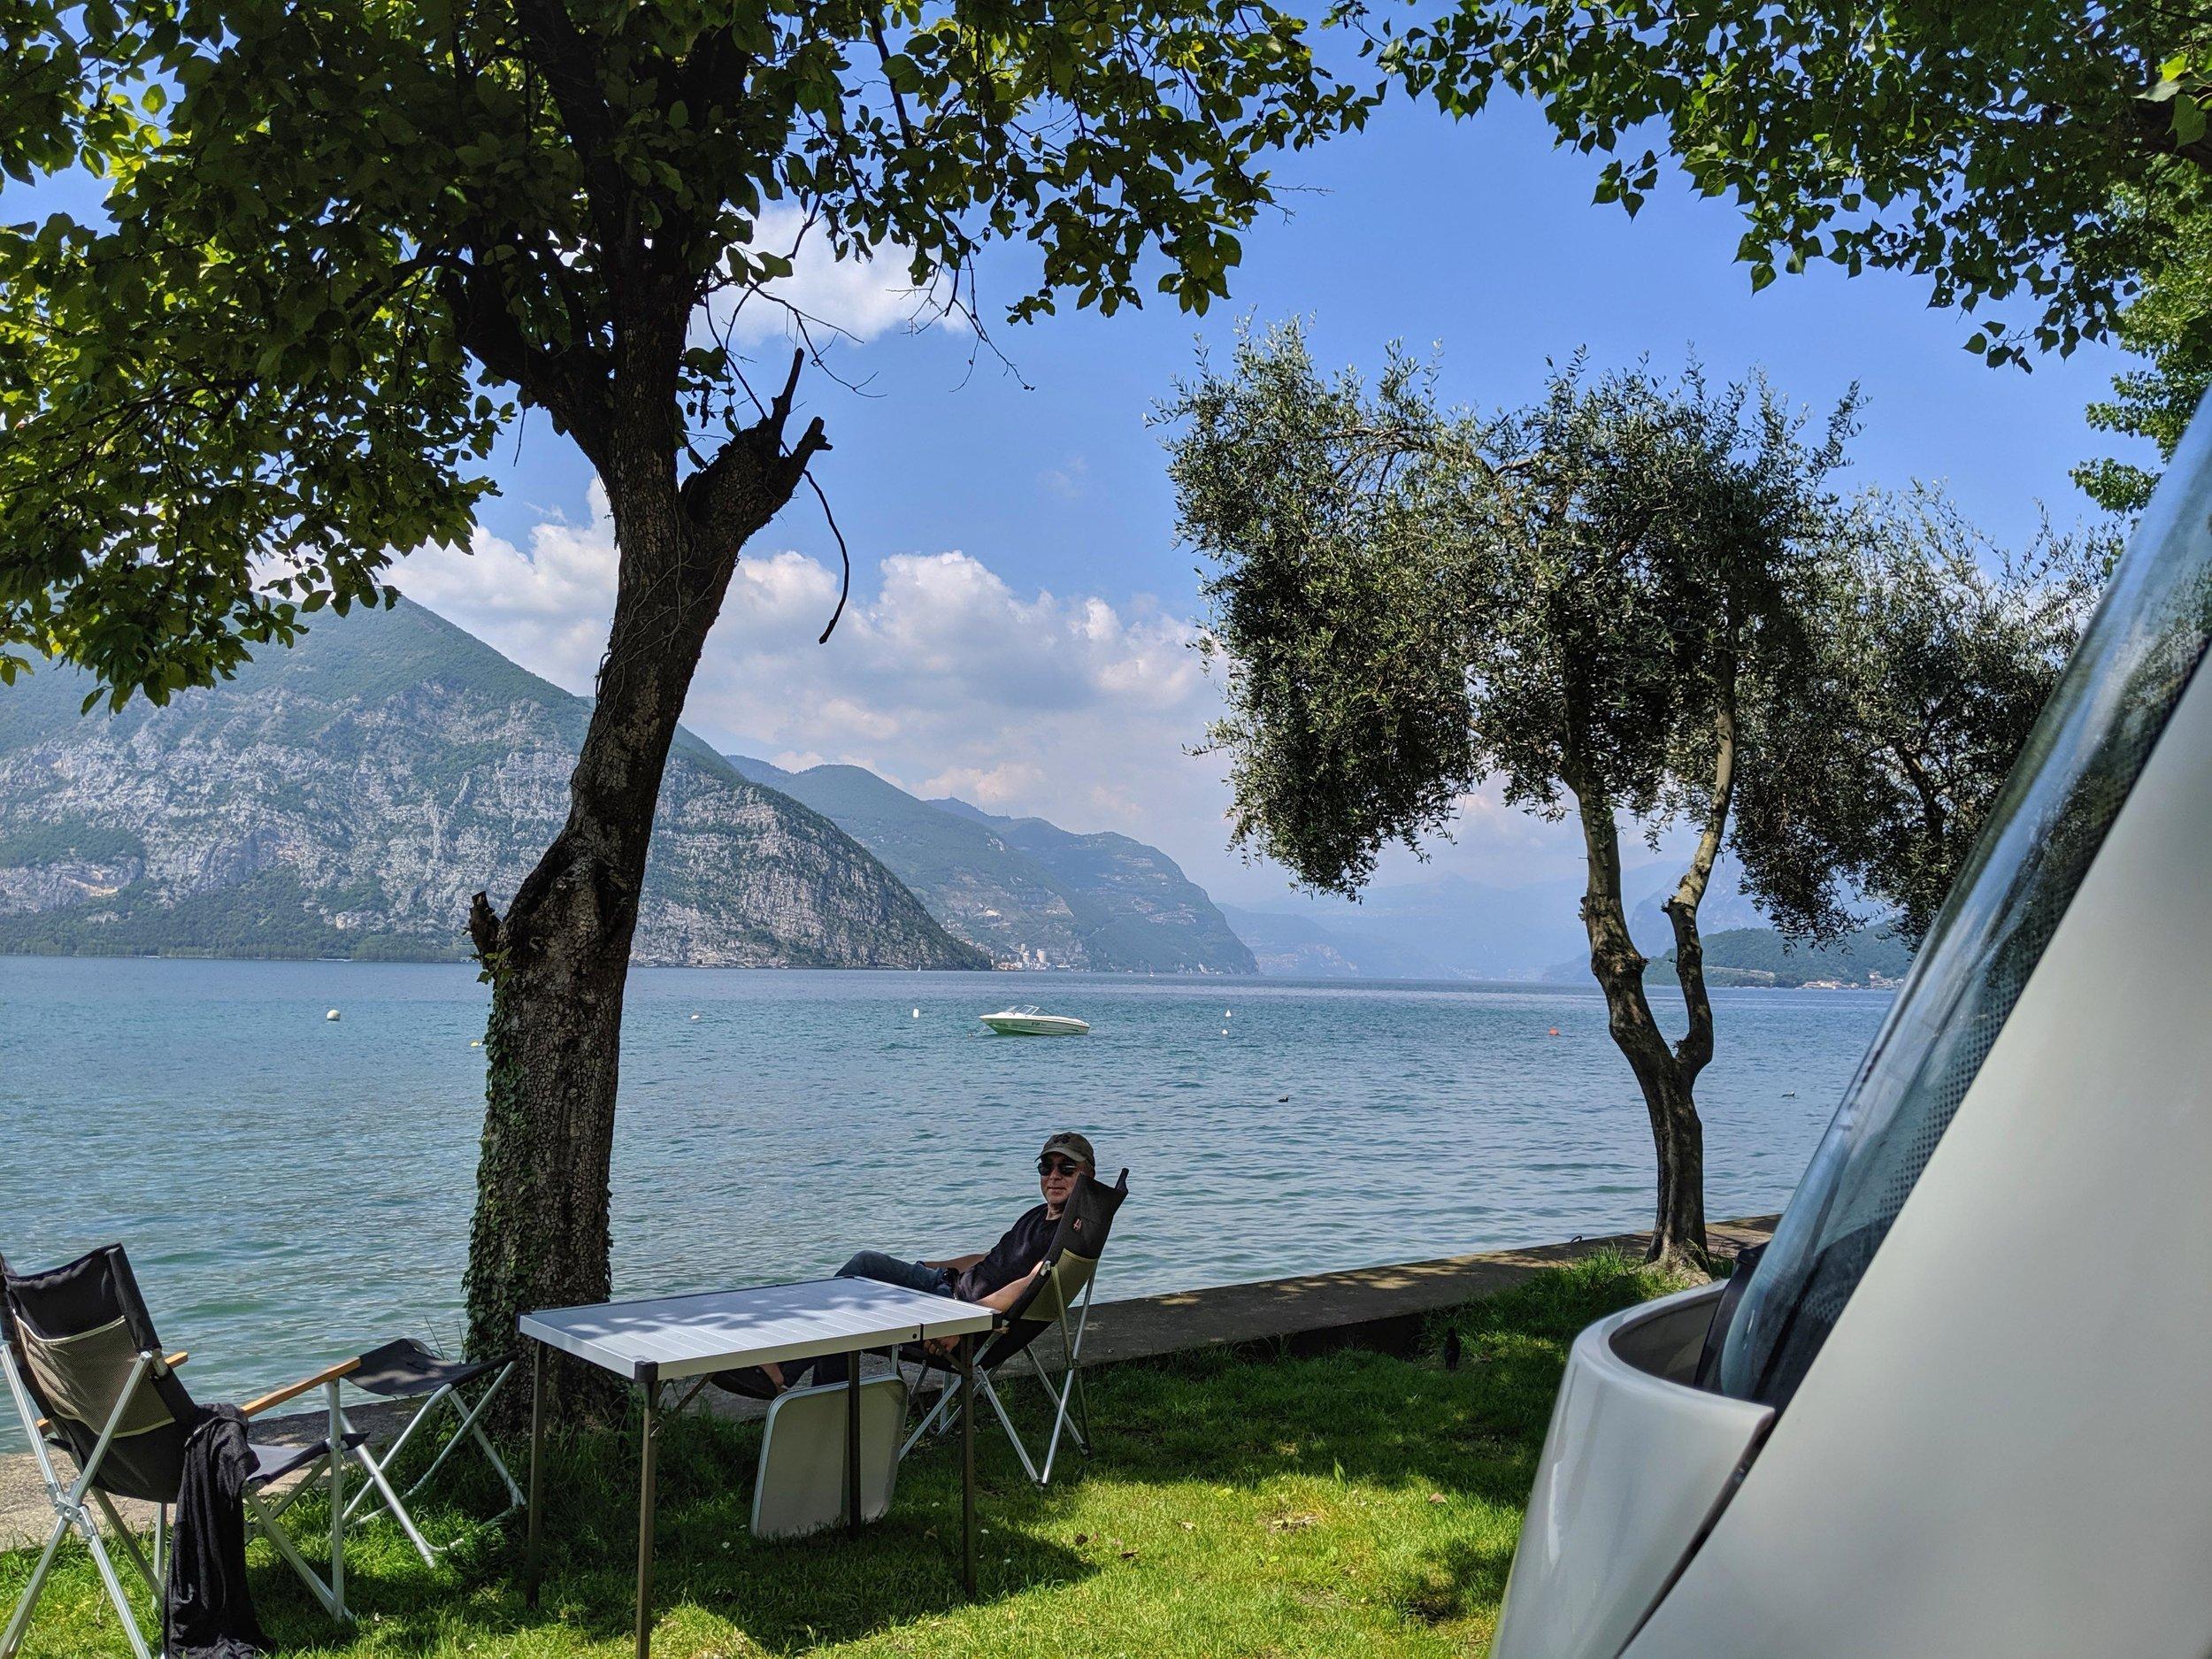 Sweet lakeside camping at Camping Covelo on Lake Iseo